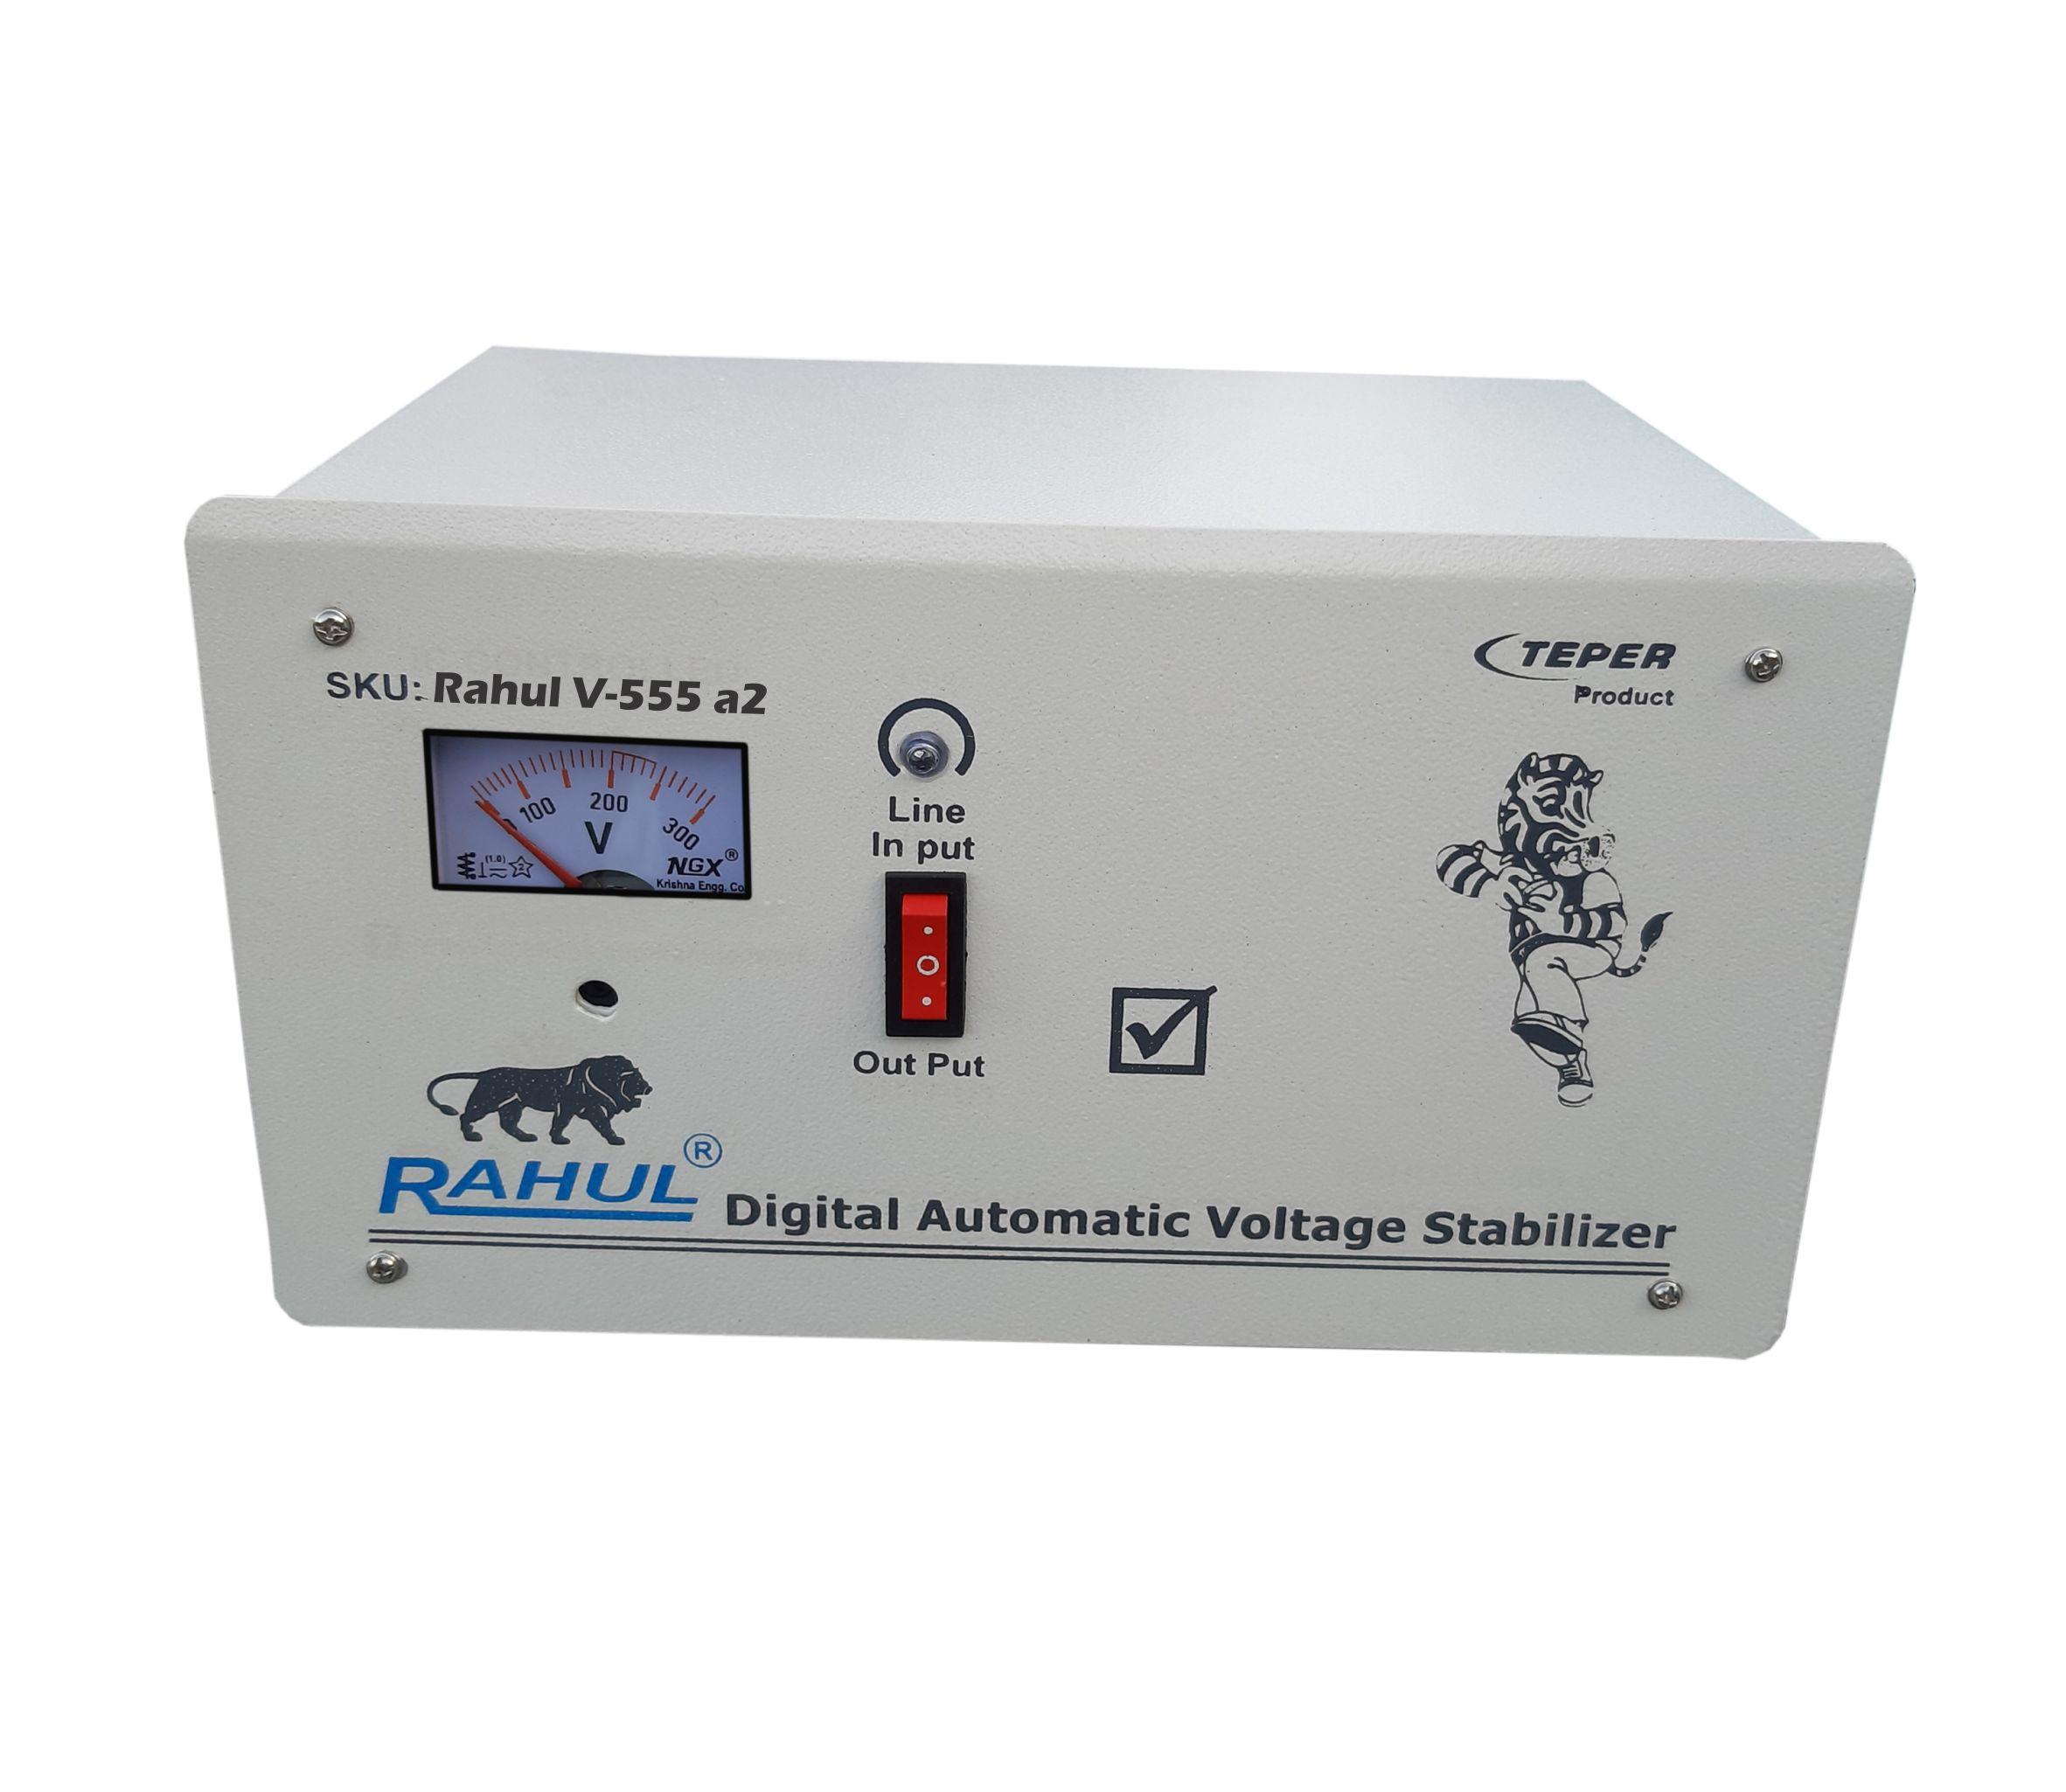 Rahul V 555 a2 Kva/8 Amp 100 280 Volt 5 Booster Mainline Automatic Digital Voltage Stabilizer